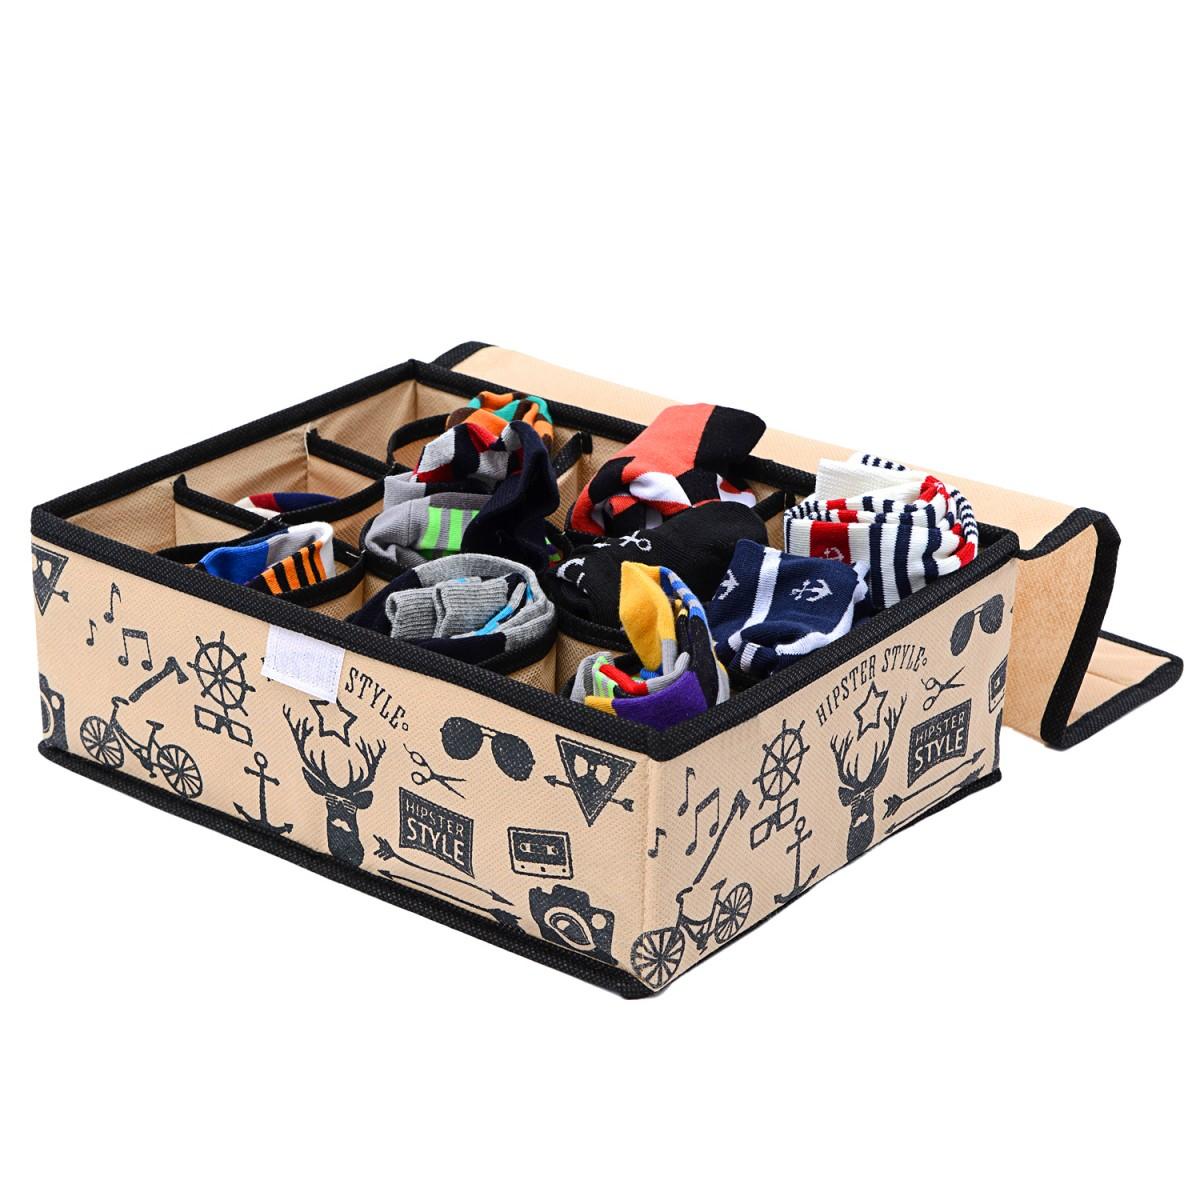 Купить органайзер с крышкой на 18 секций Hipster Style 31 х 24 х 11 см